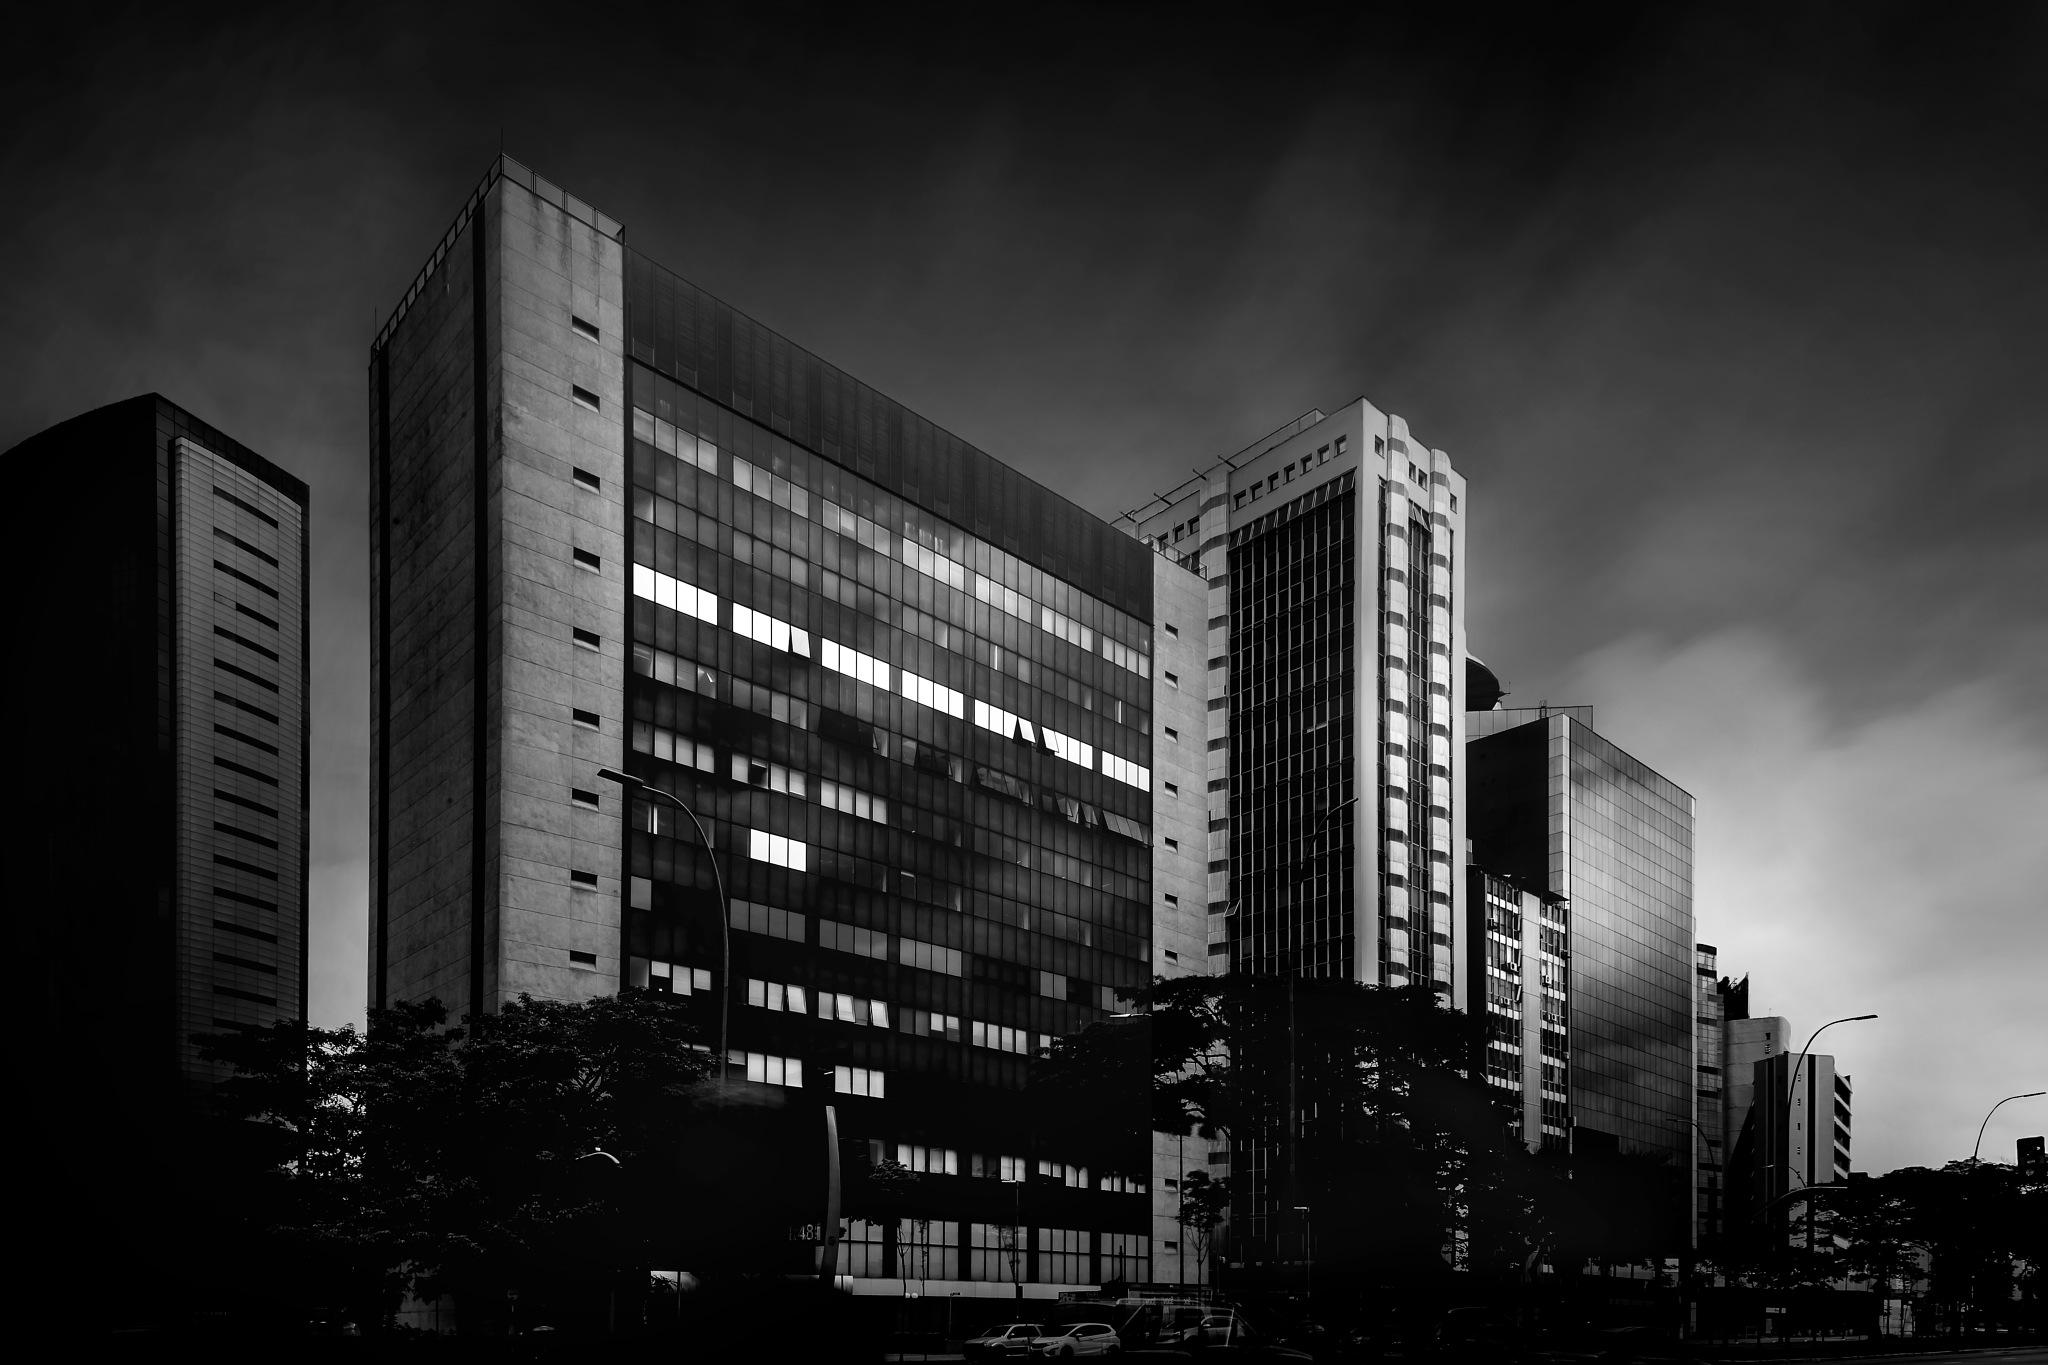 Big city by Erike Fusiki